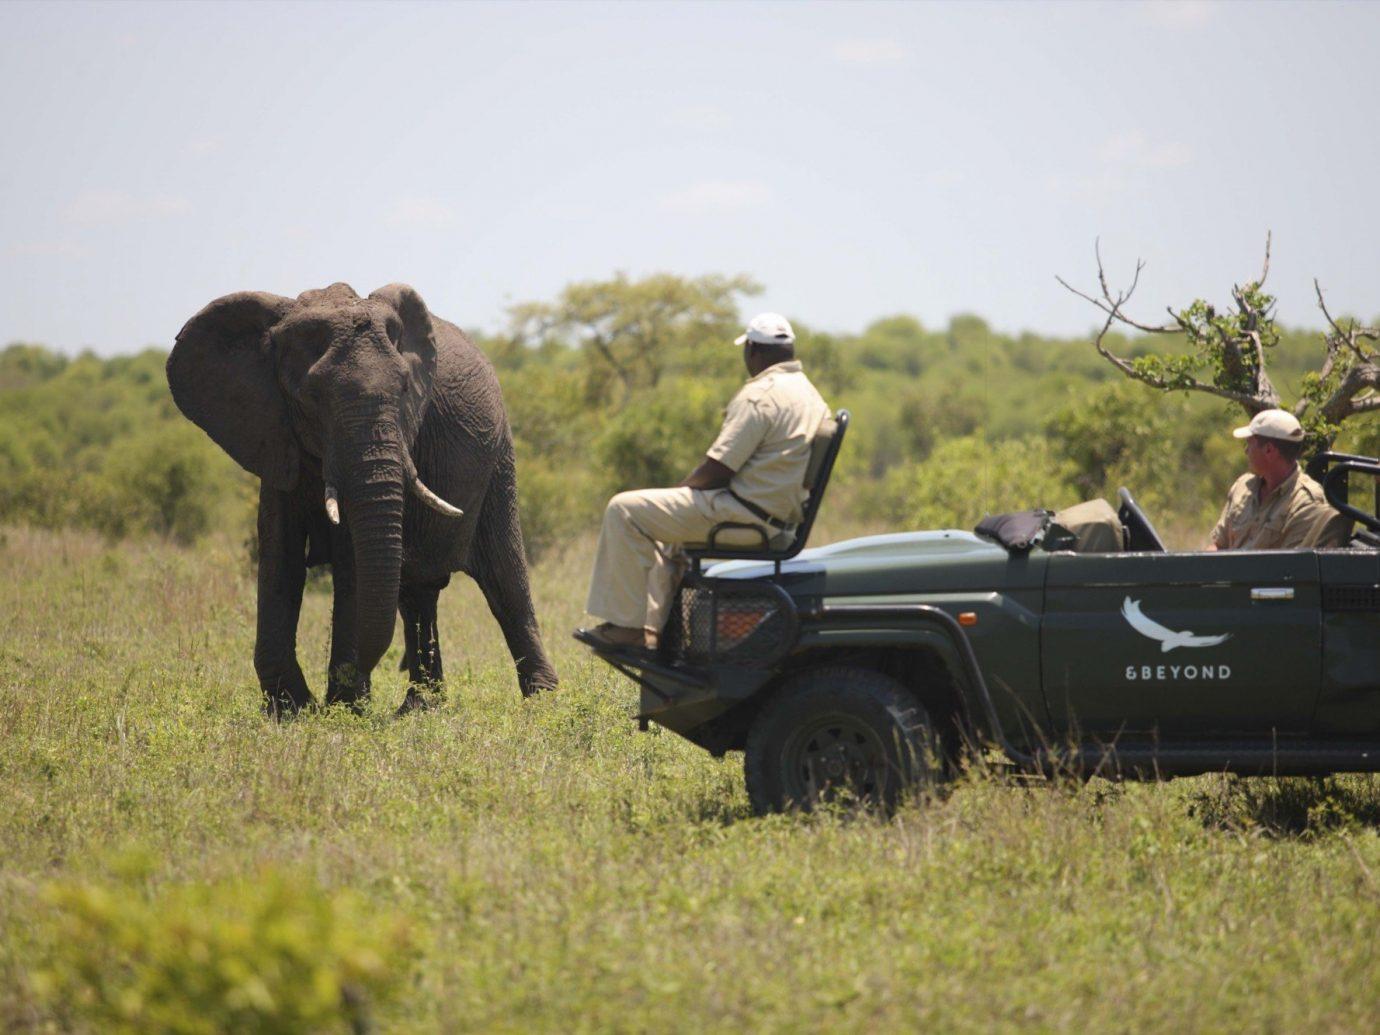 Outdoors + Adventure Travel Tips grass outdoor sky field Safari mammal Adventure grassy elephant military herd lush